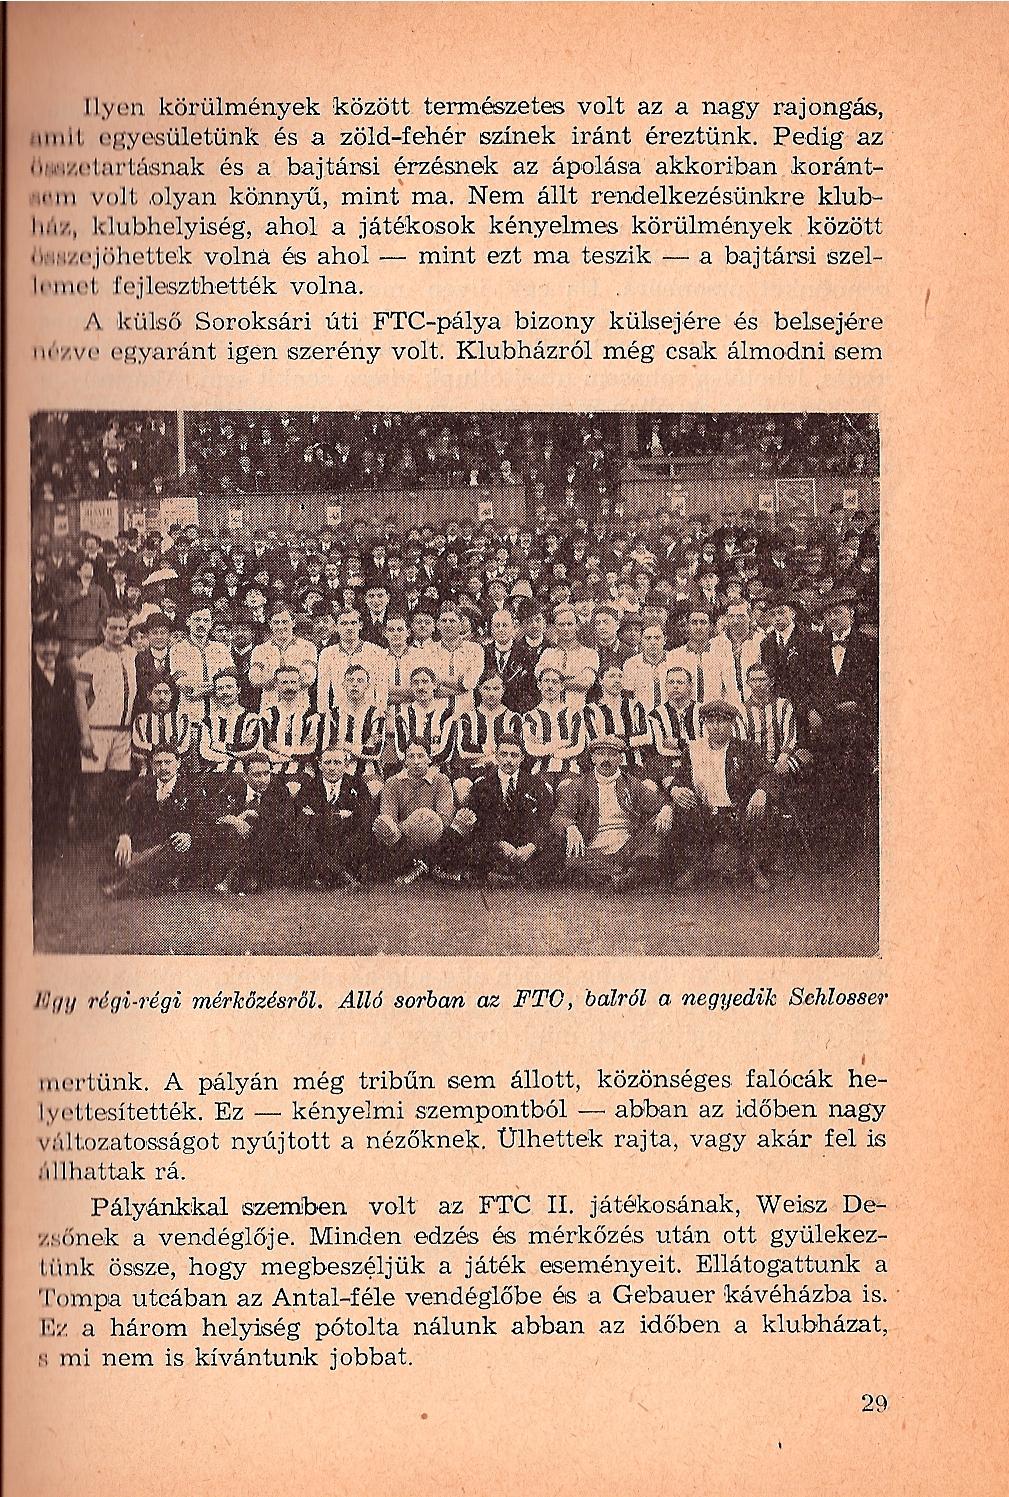 schlosser_fel-evszazad_1957_29_1020